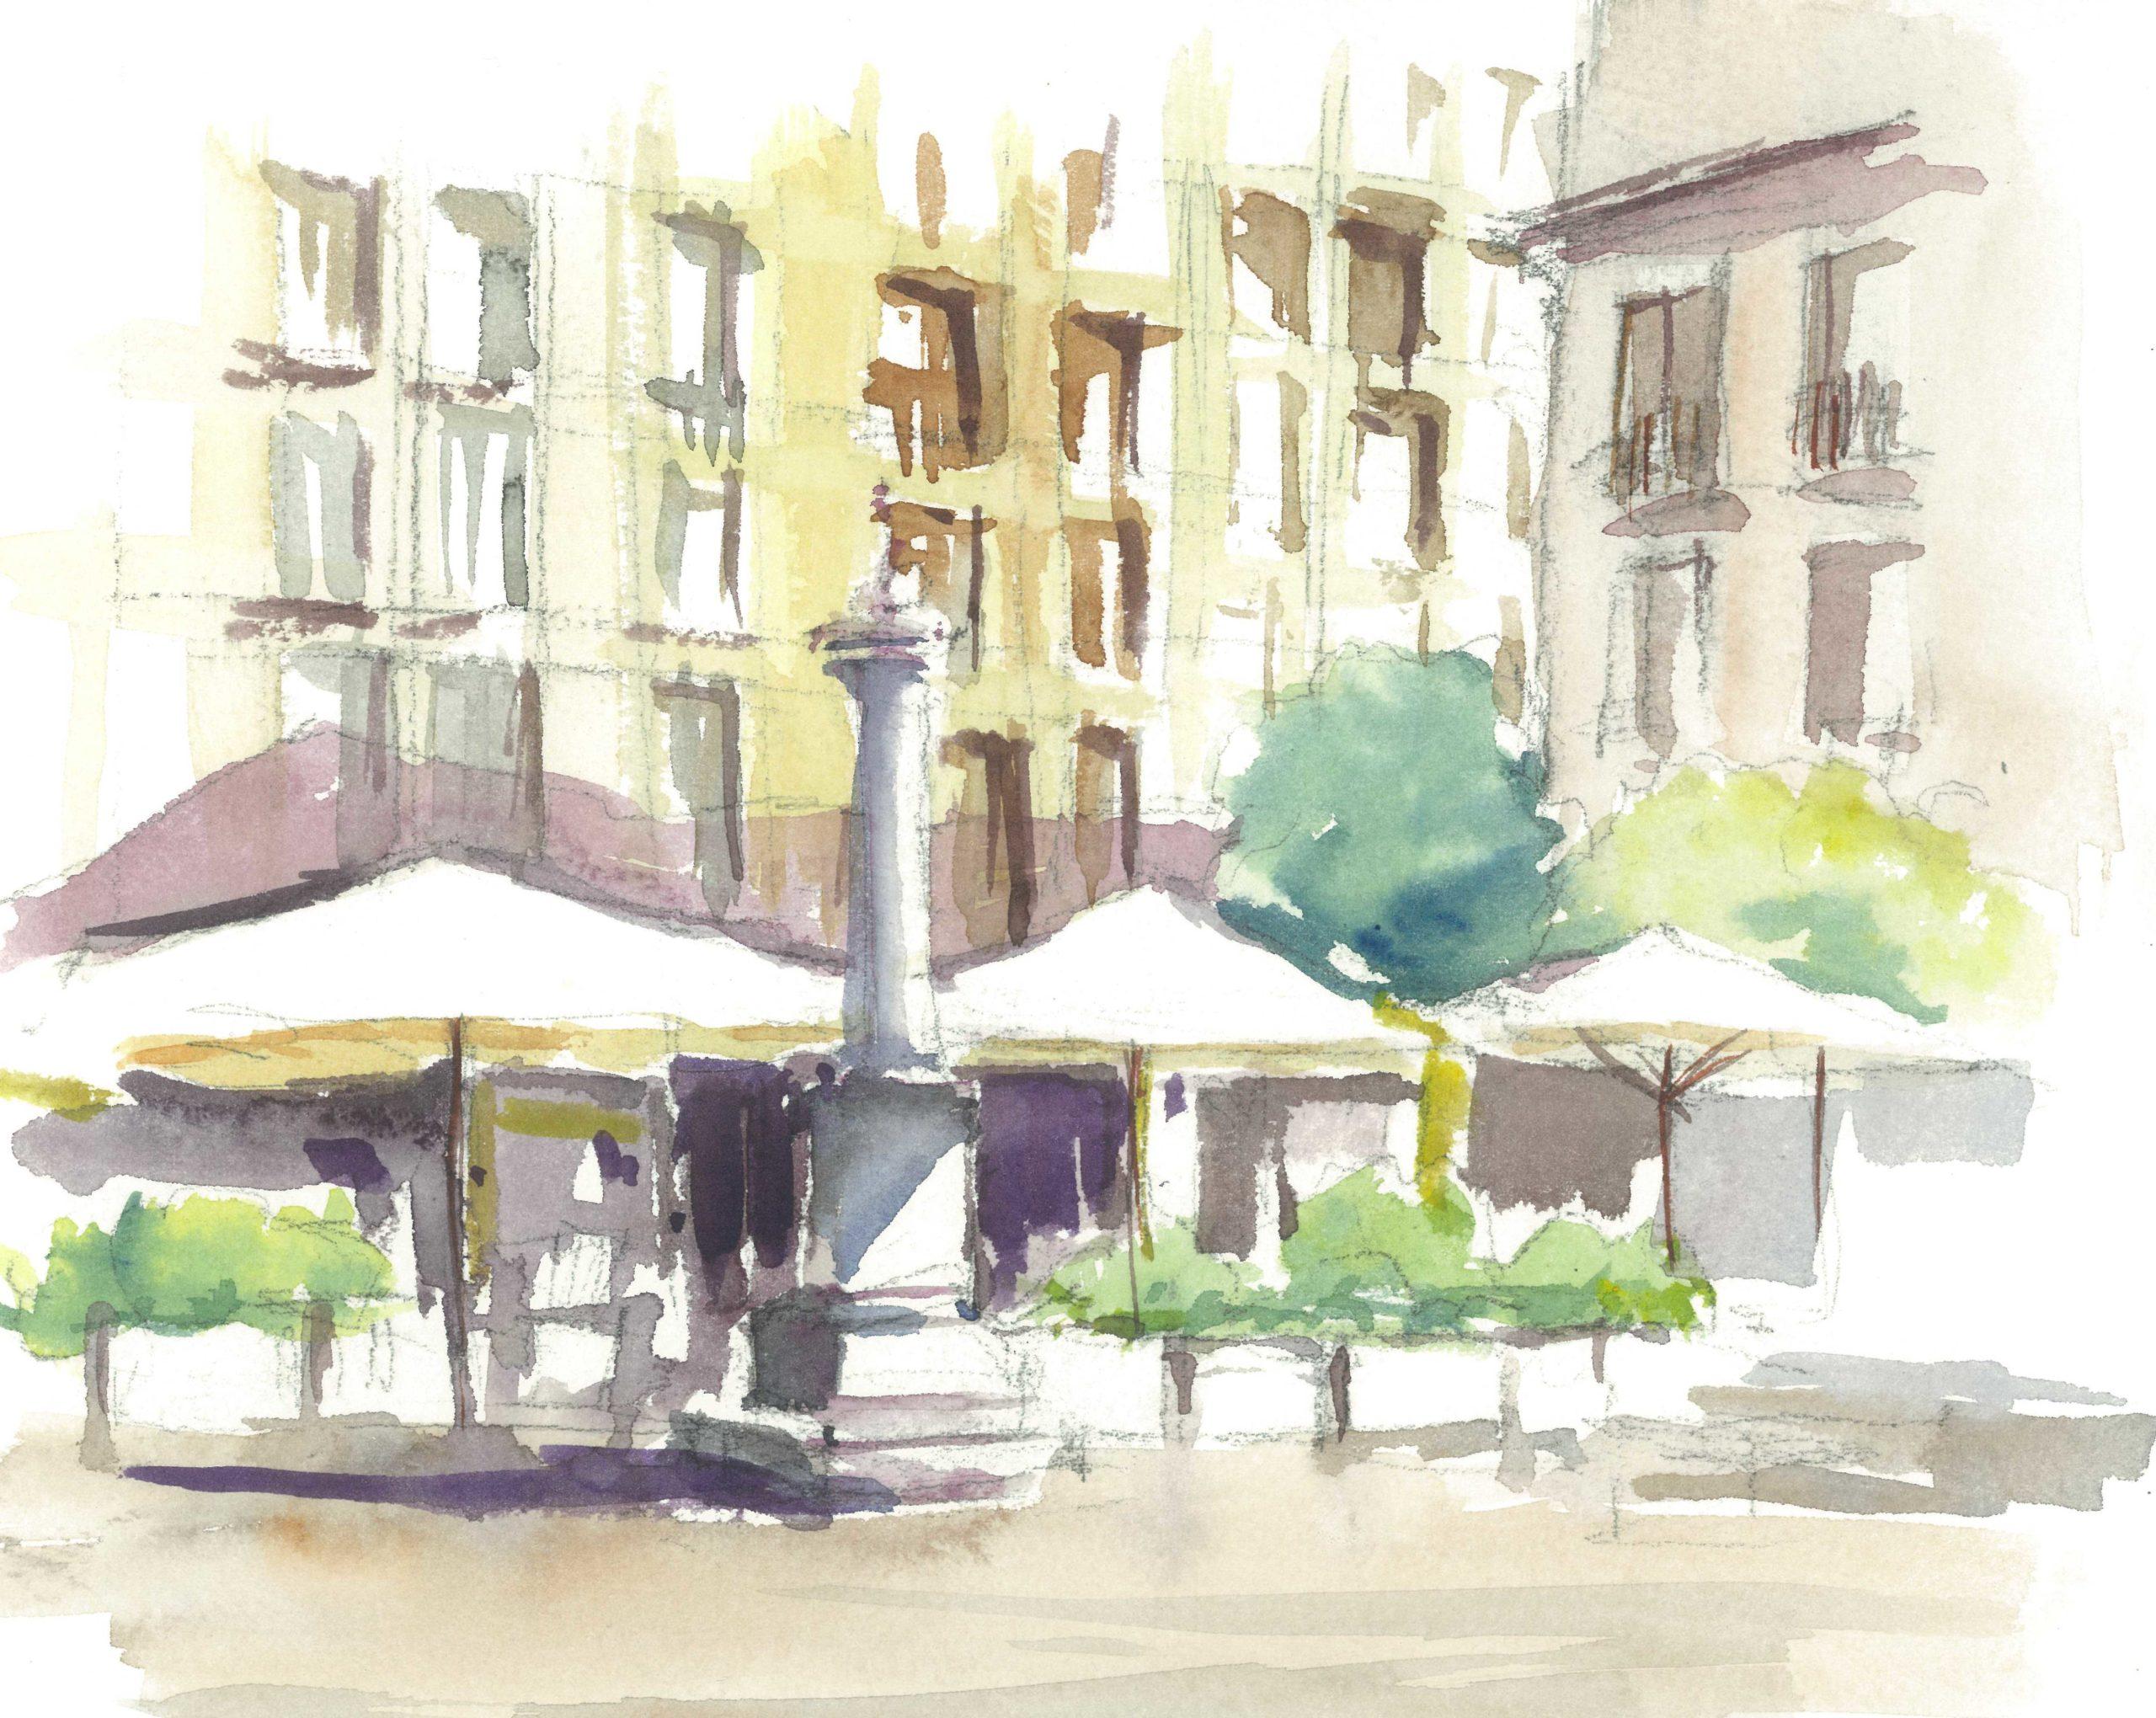 Descubriendo la Plaza de Ramales